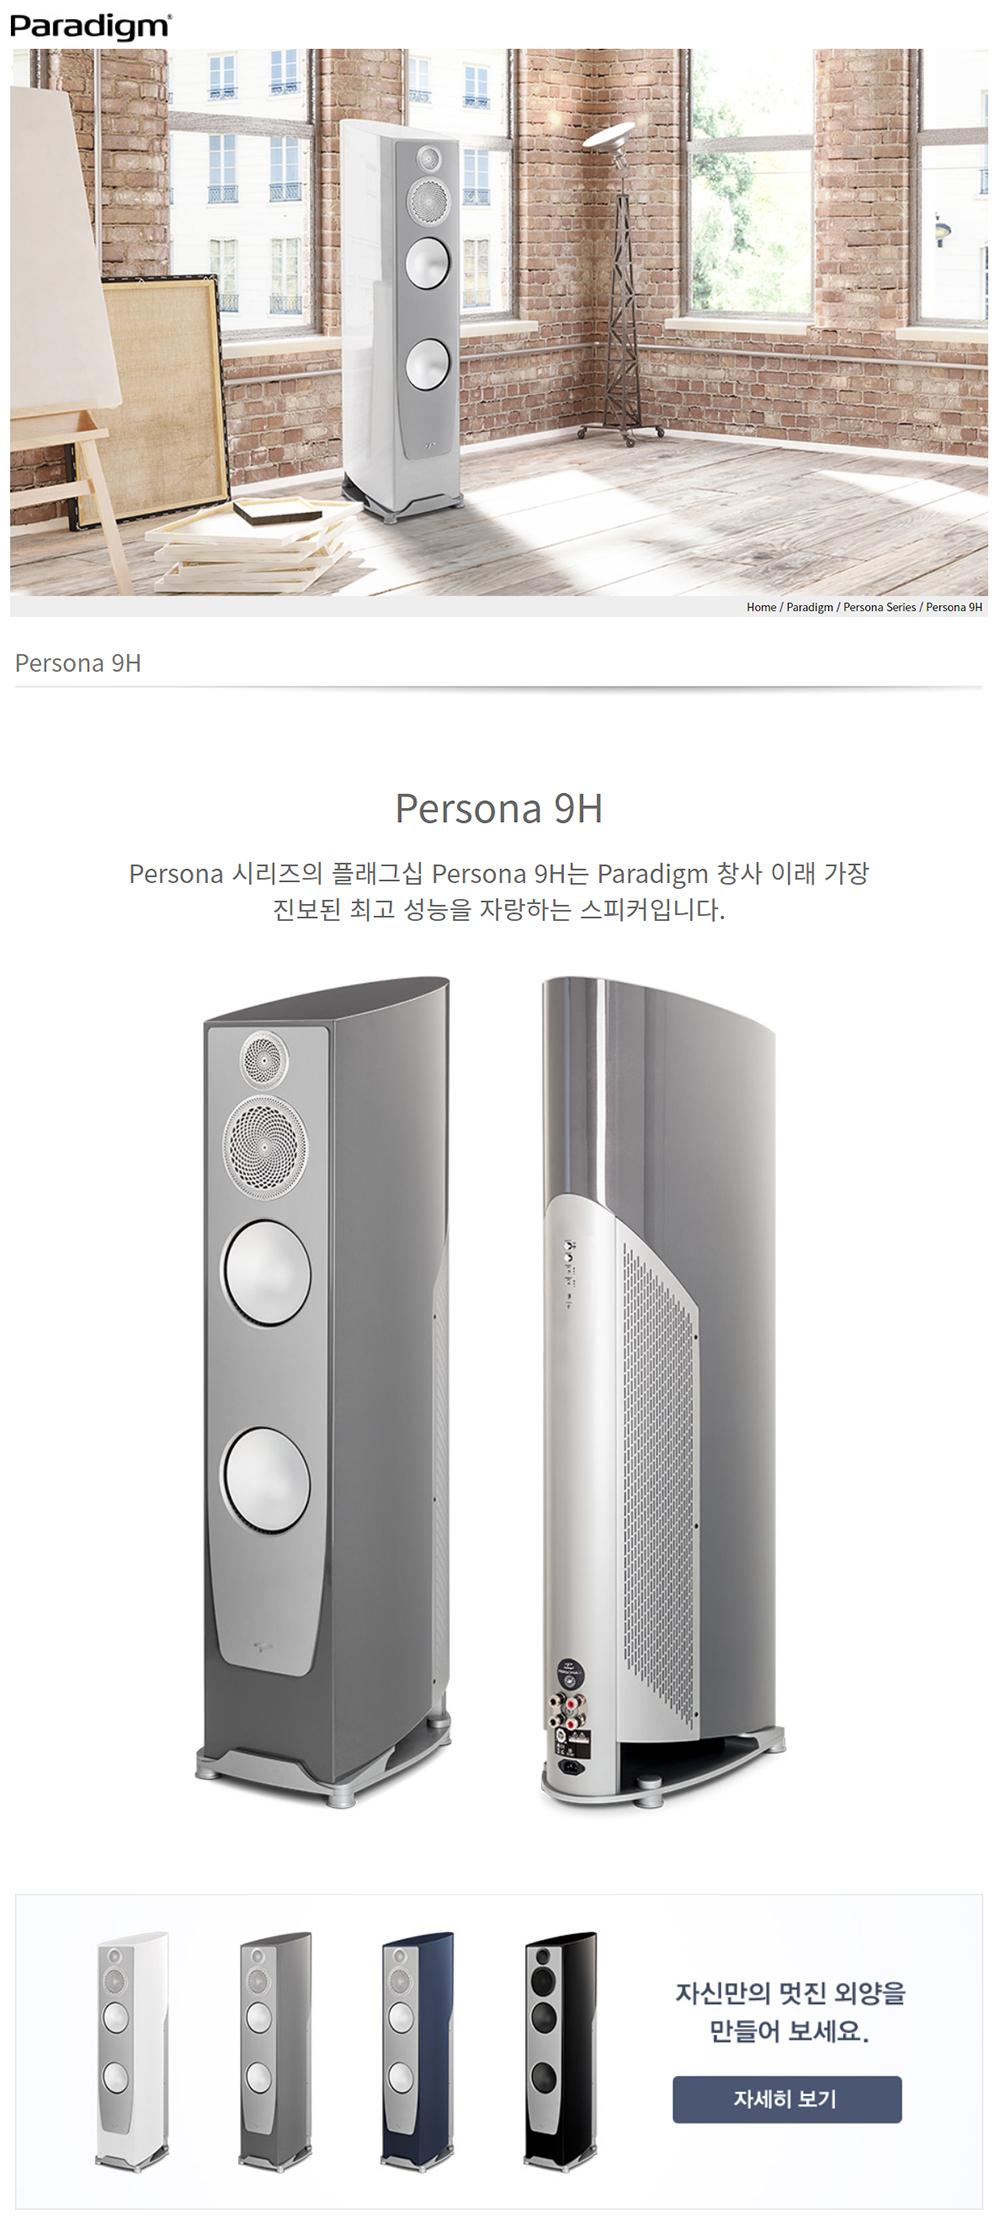 Persona 9H_1.jpg